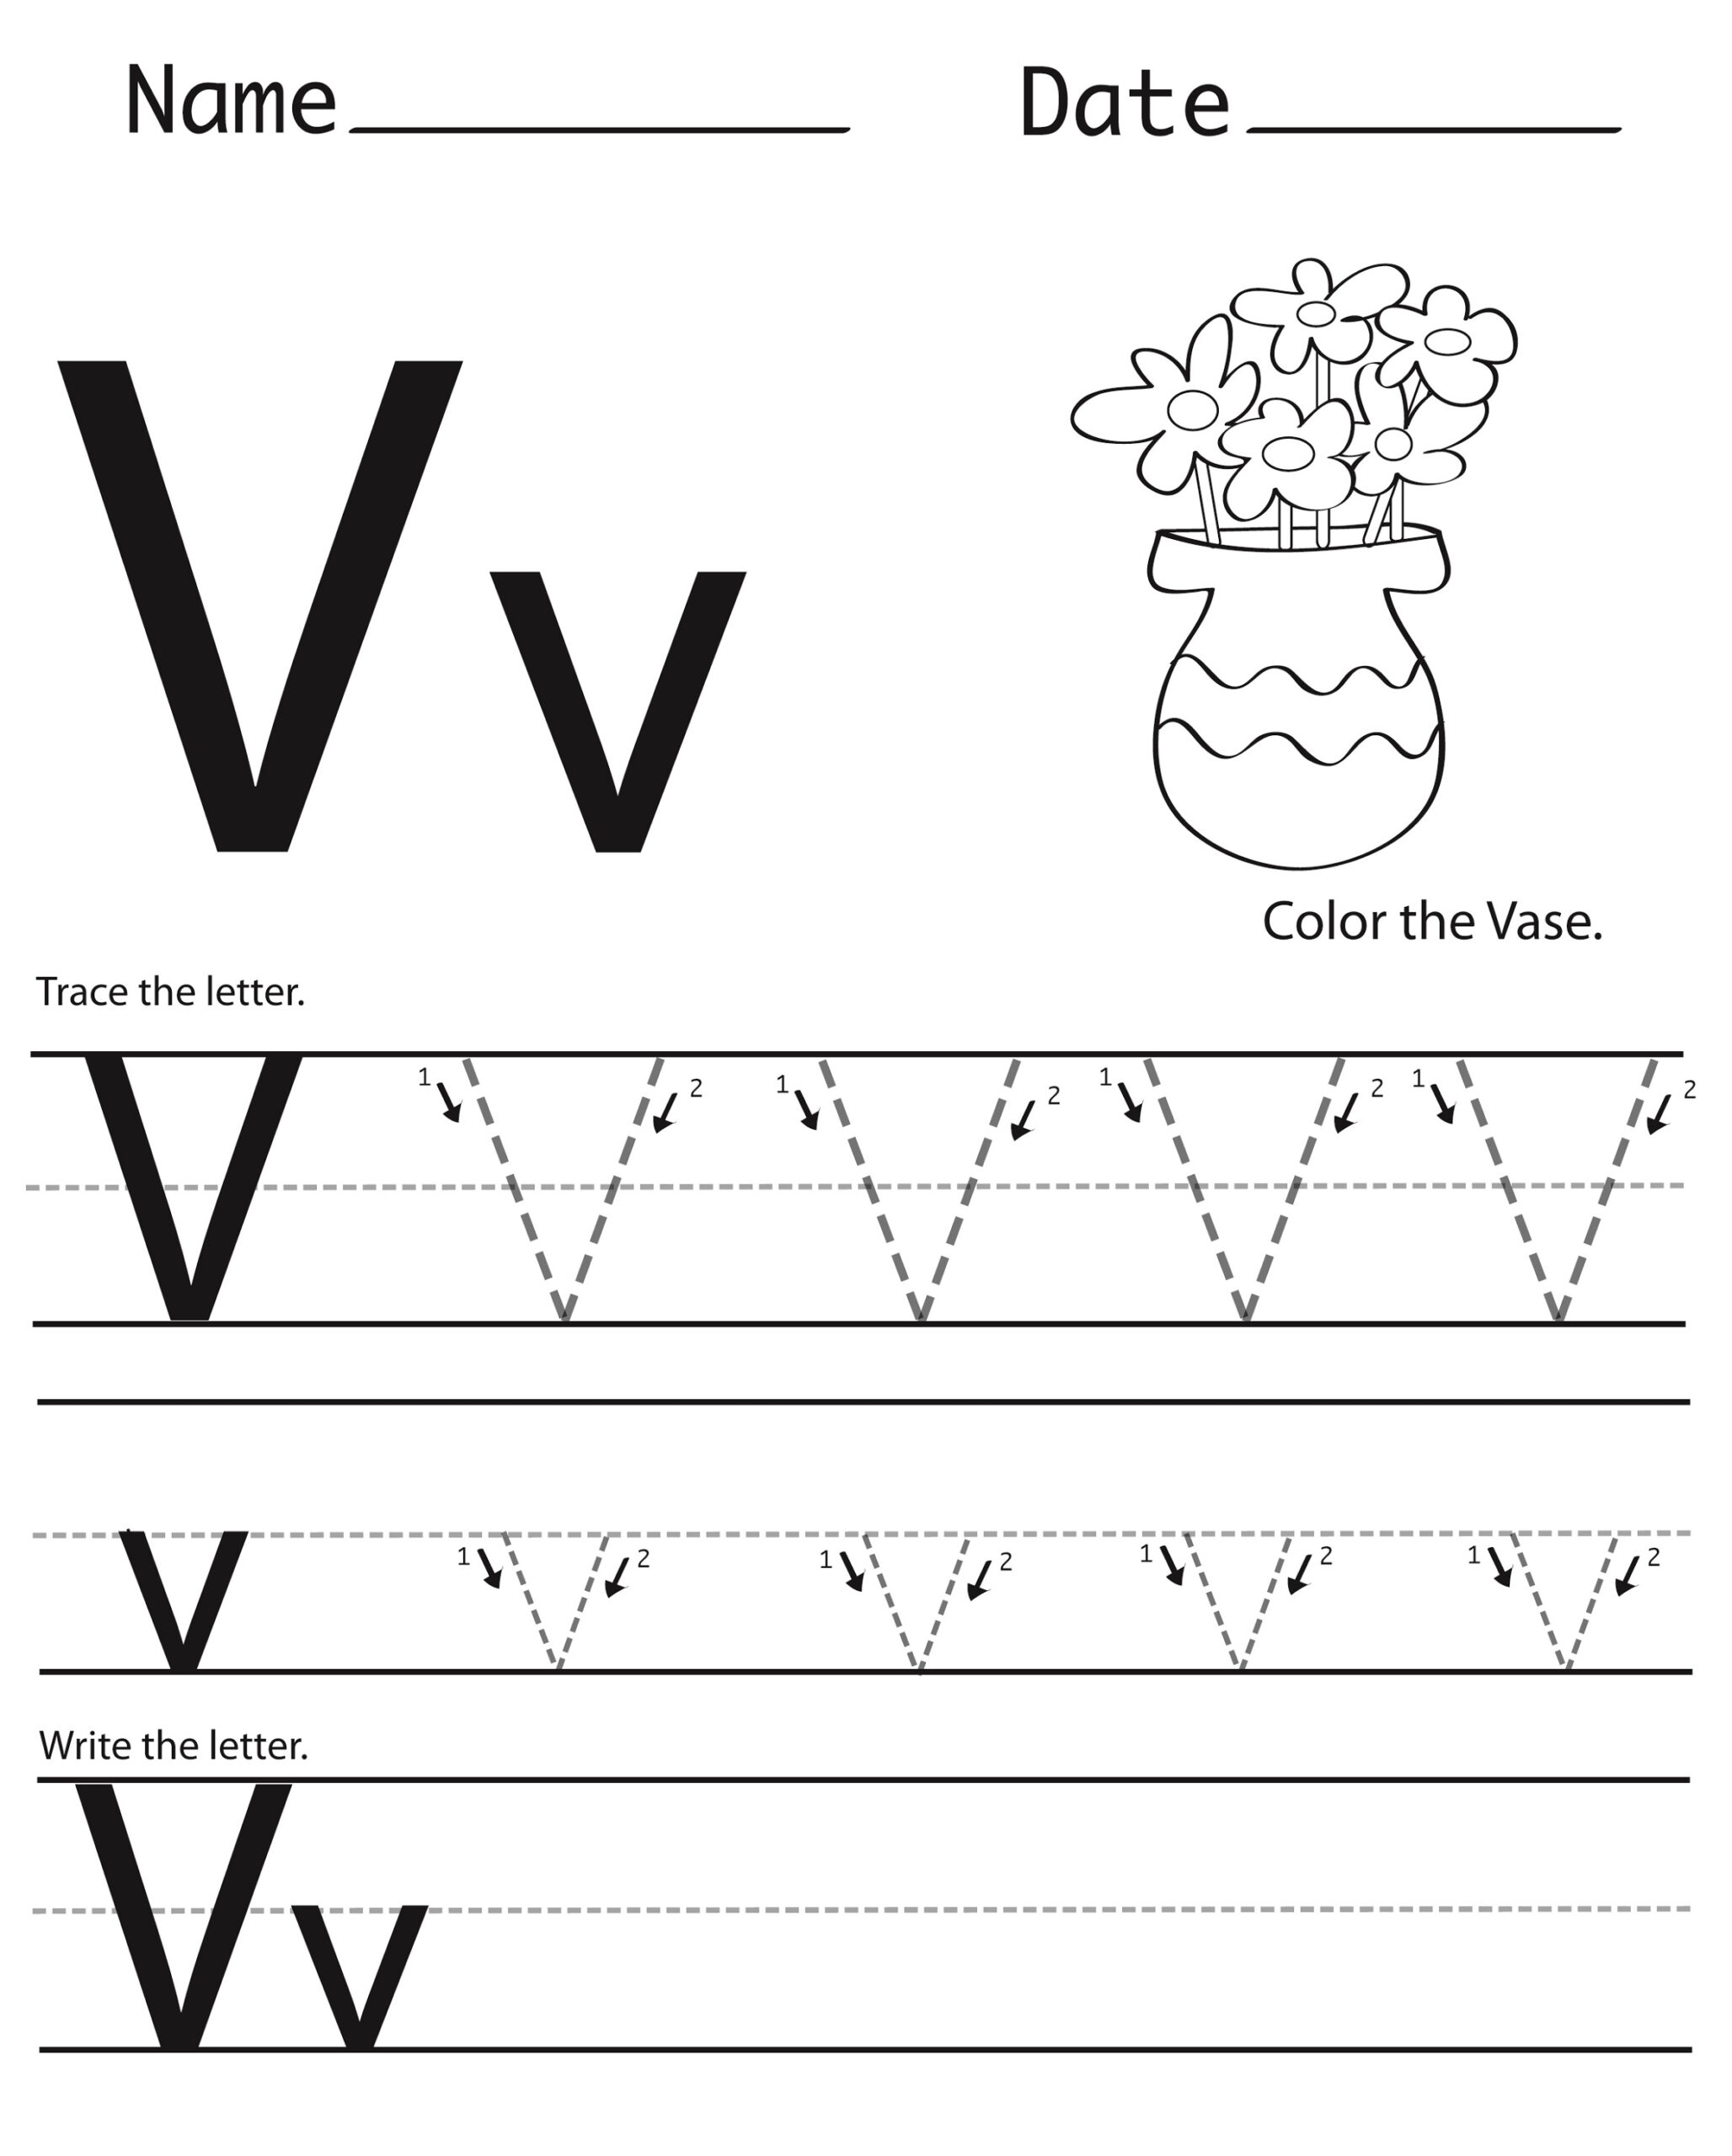 Letter V Worksheets To Print | Activity Shelter regarding Letter V Tracing Preschool